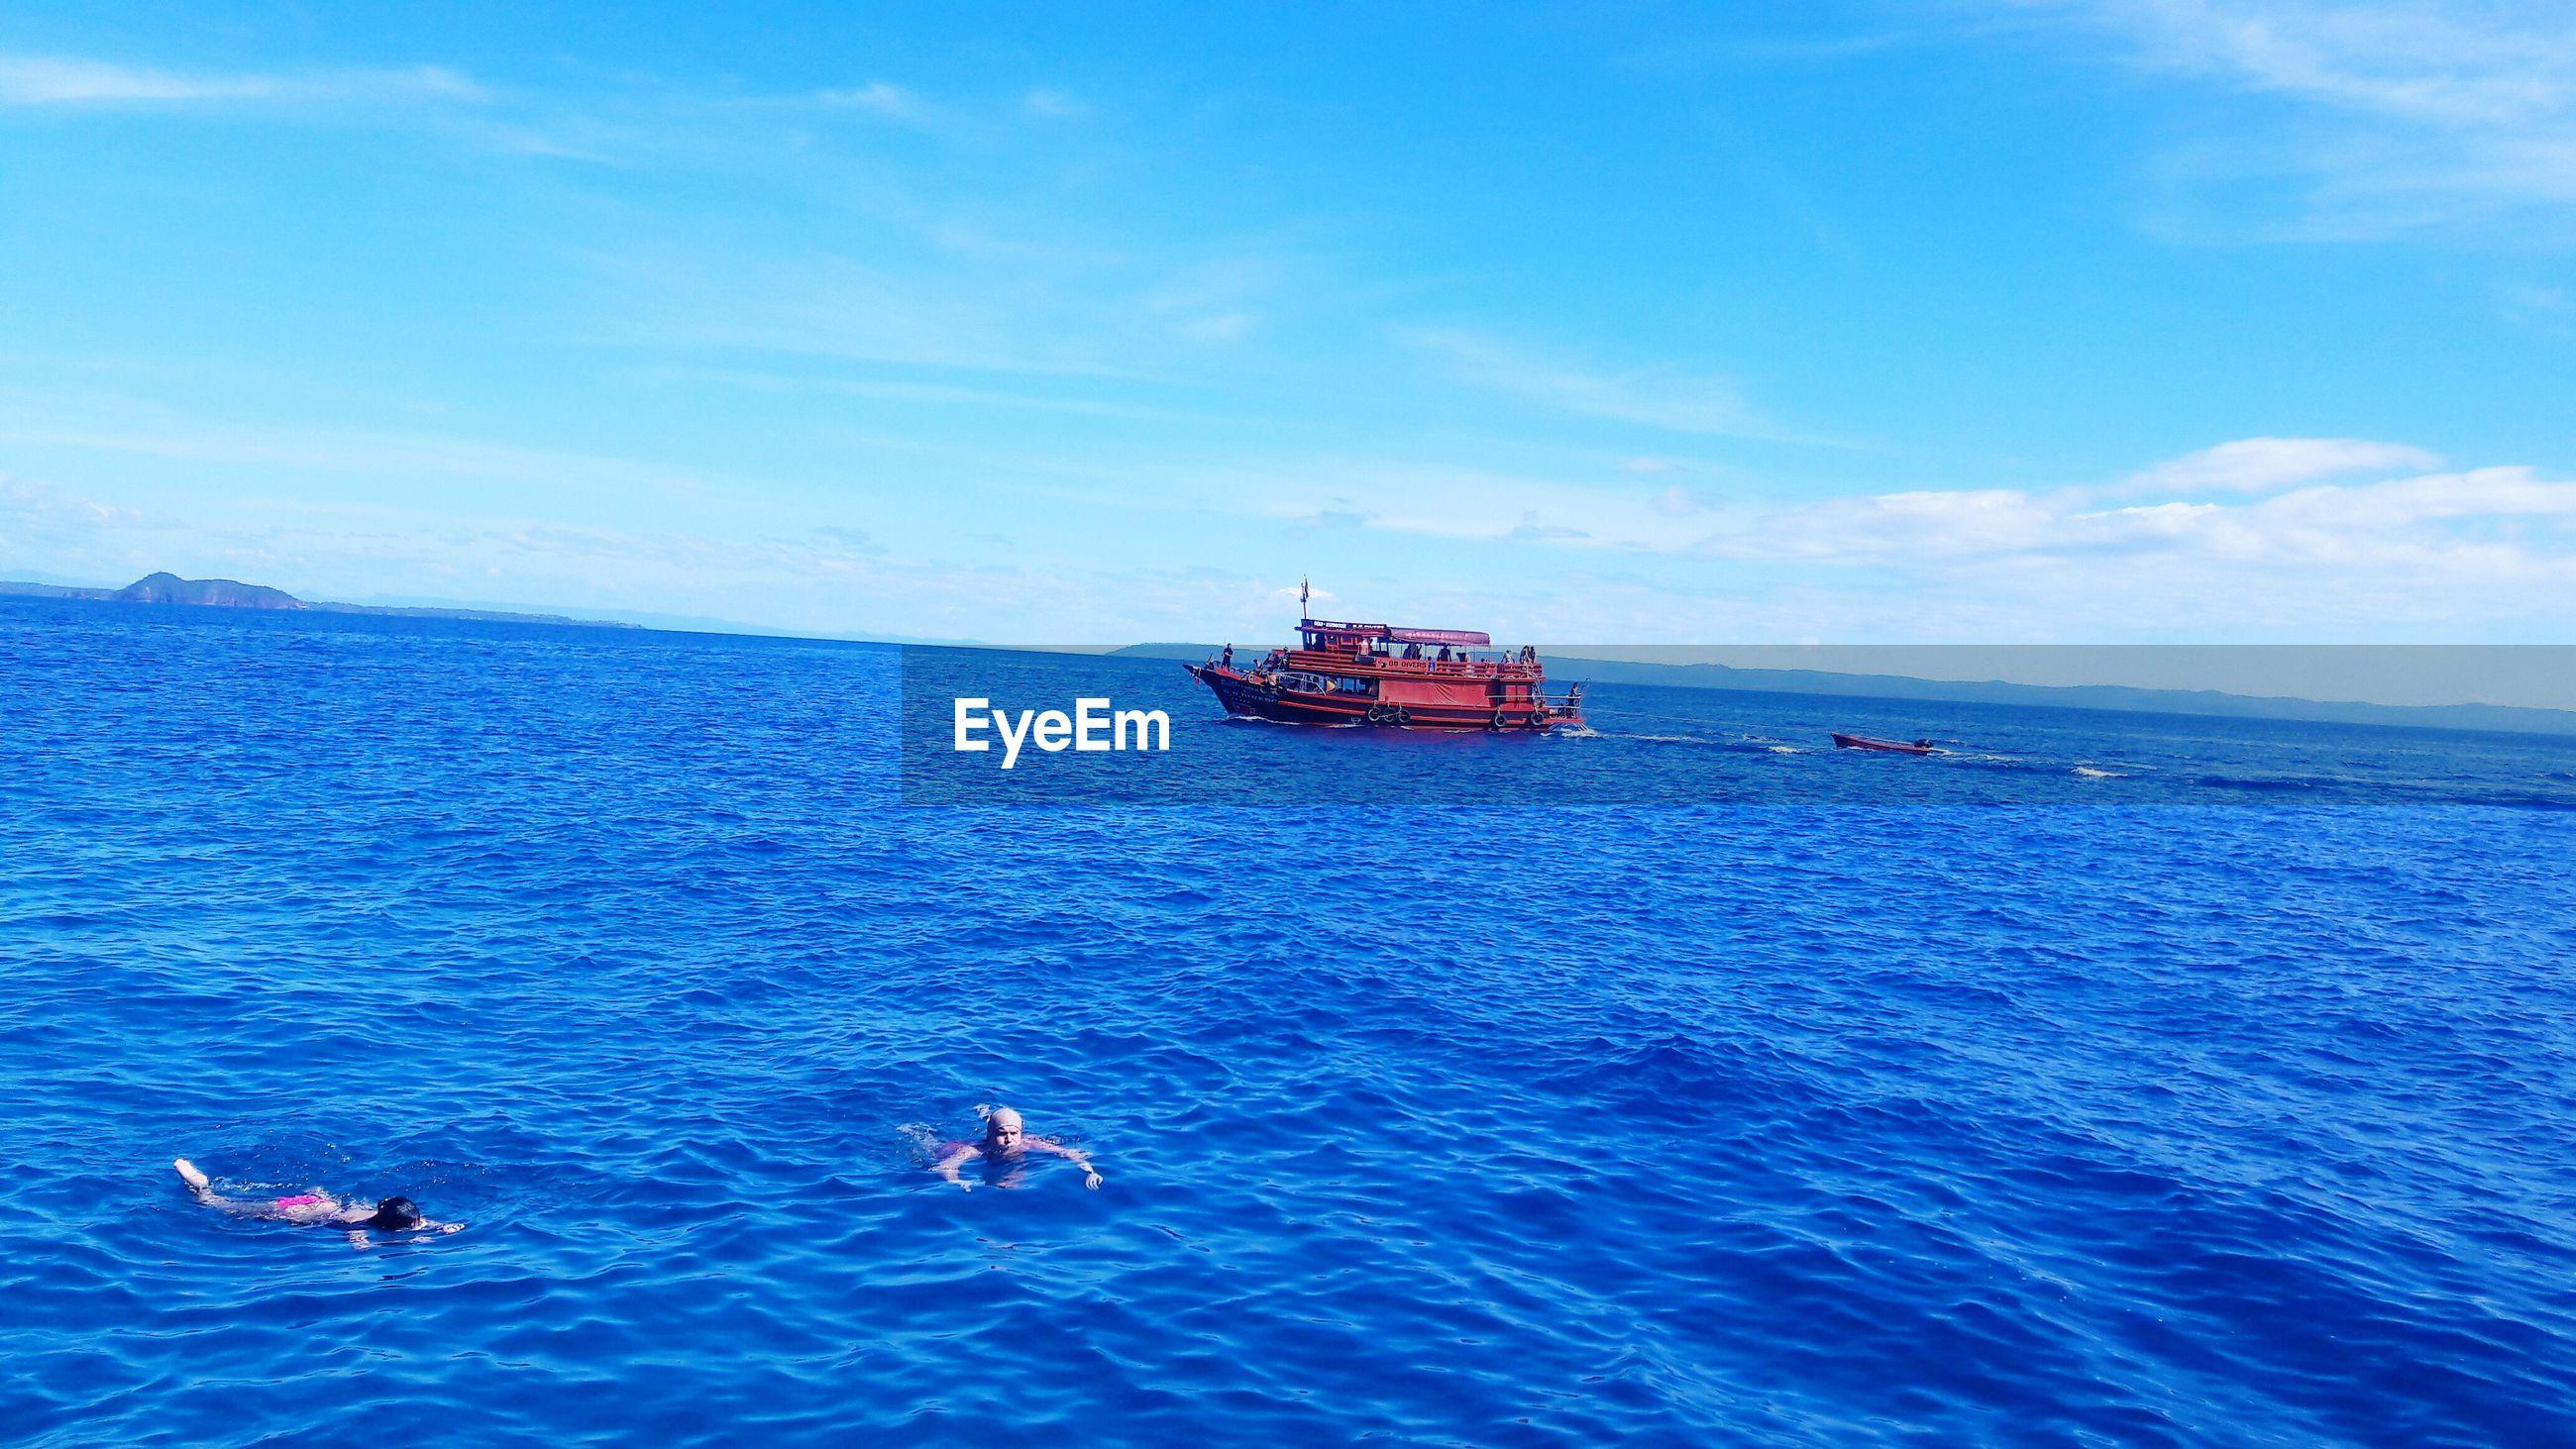 Friends swimming in sea against blue sky